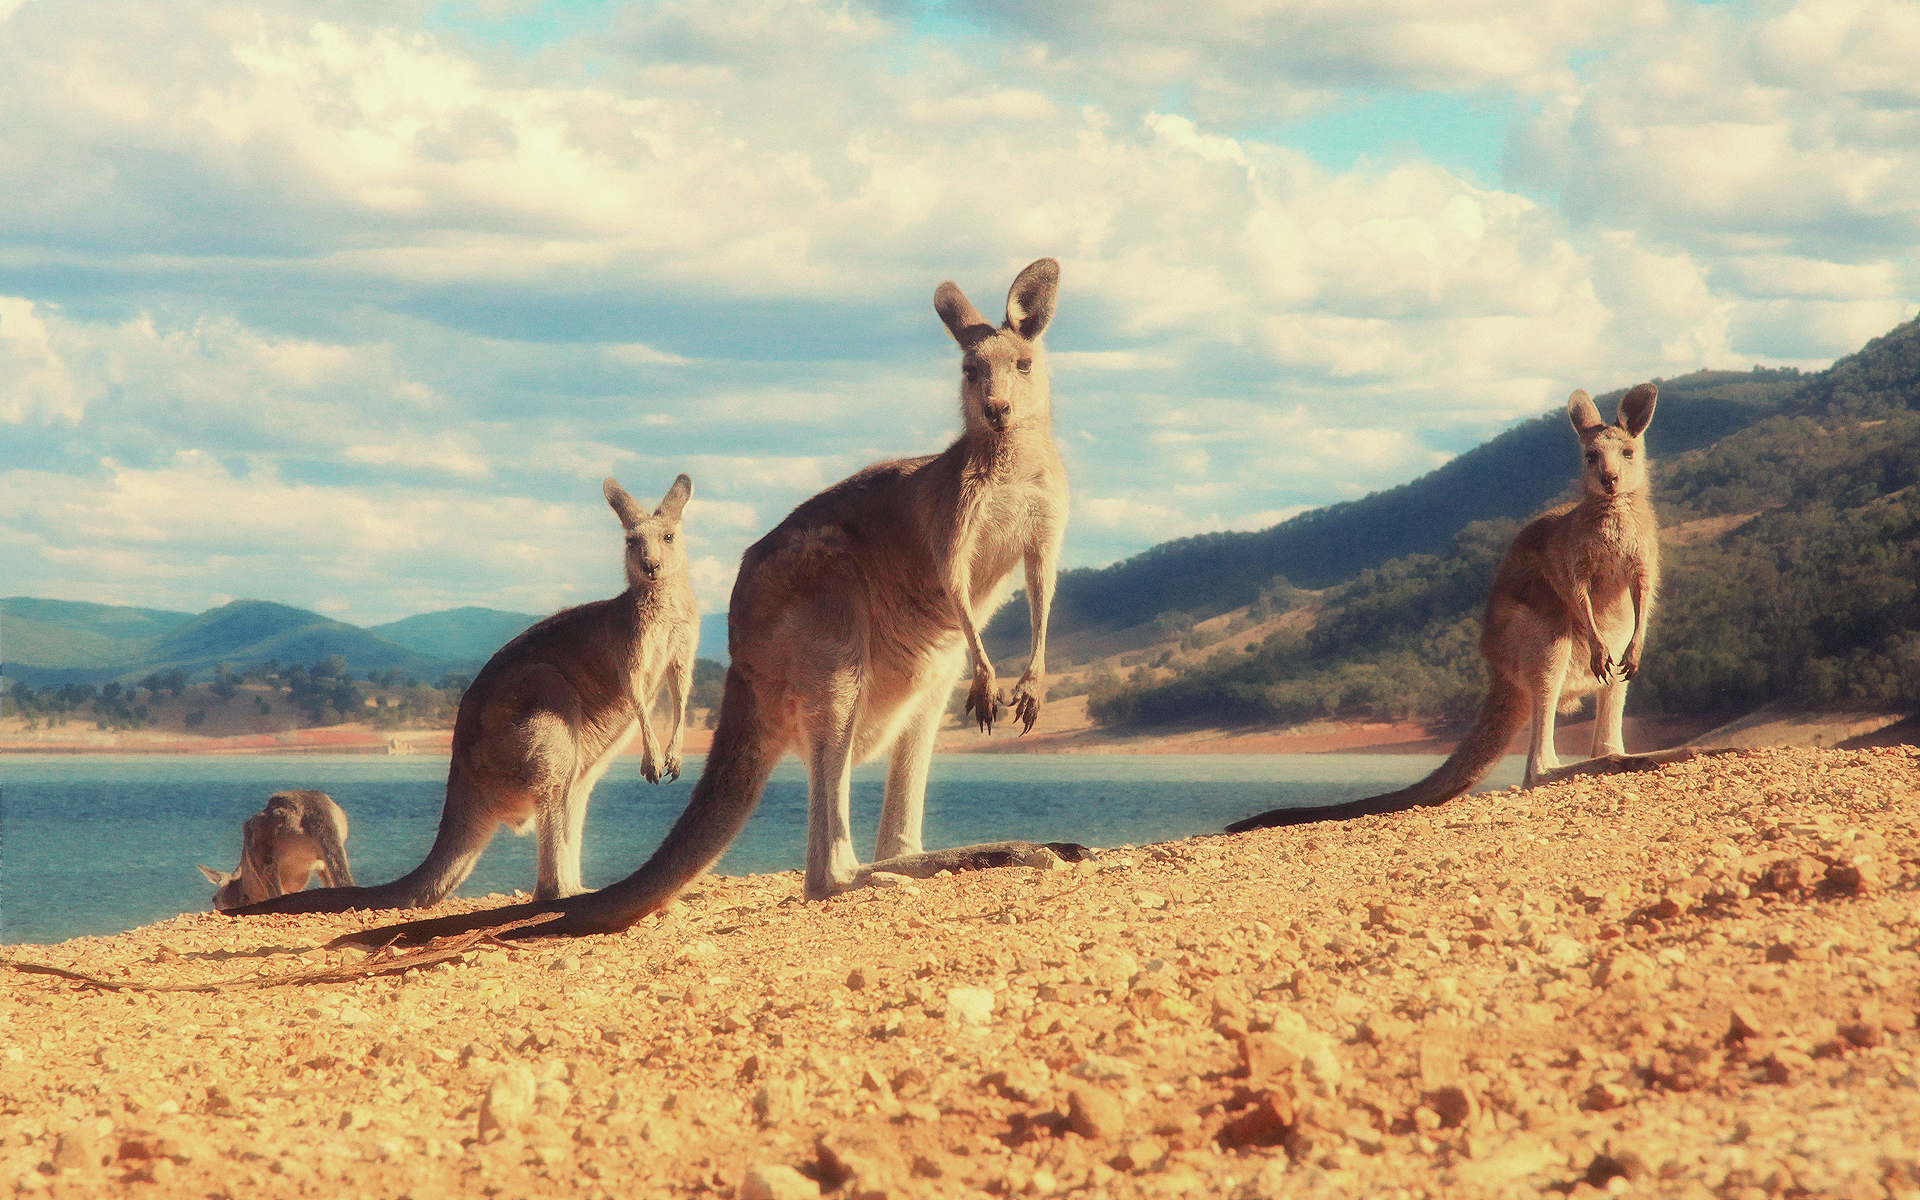 Cute Desktop Wallpaper Reddit Kangaroo Hd Wallpaper Background Image 1920x1200 Id